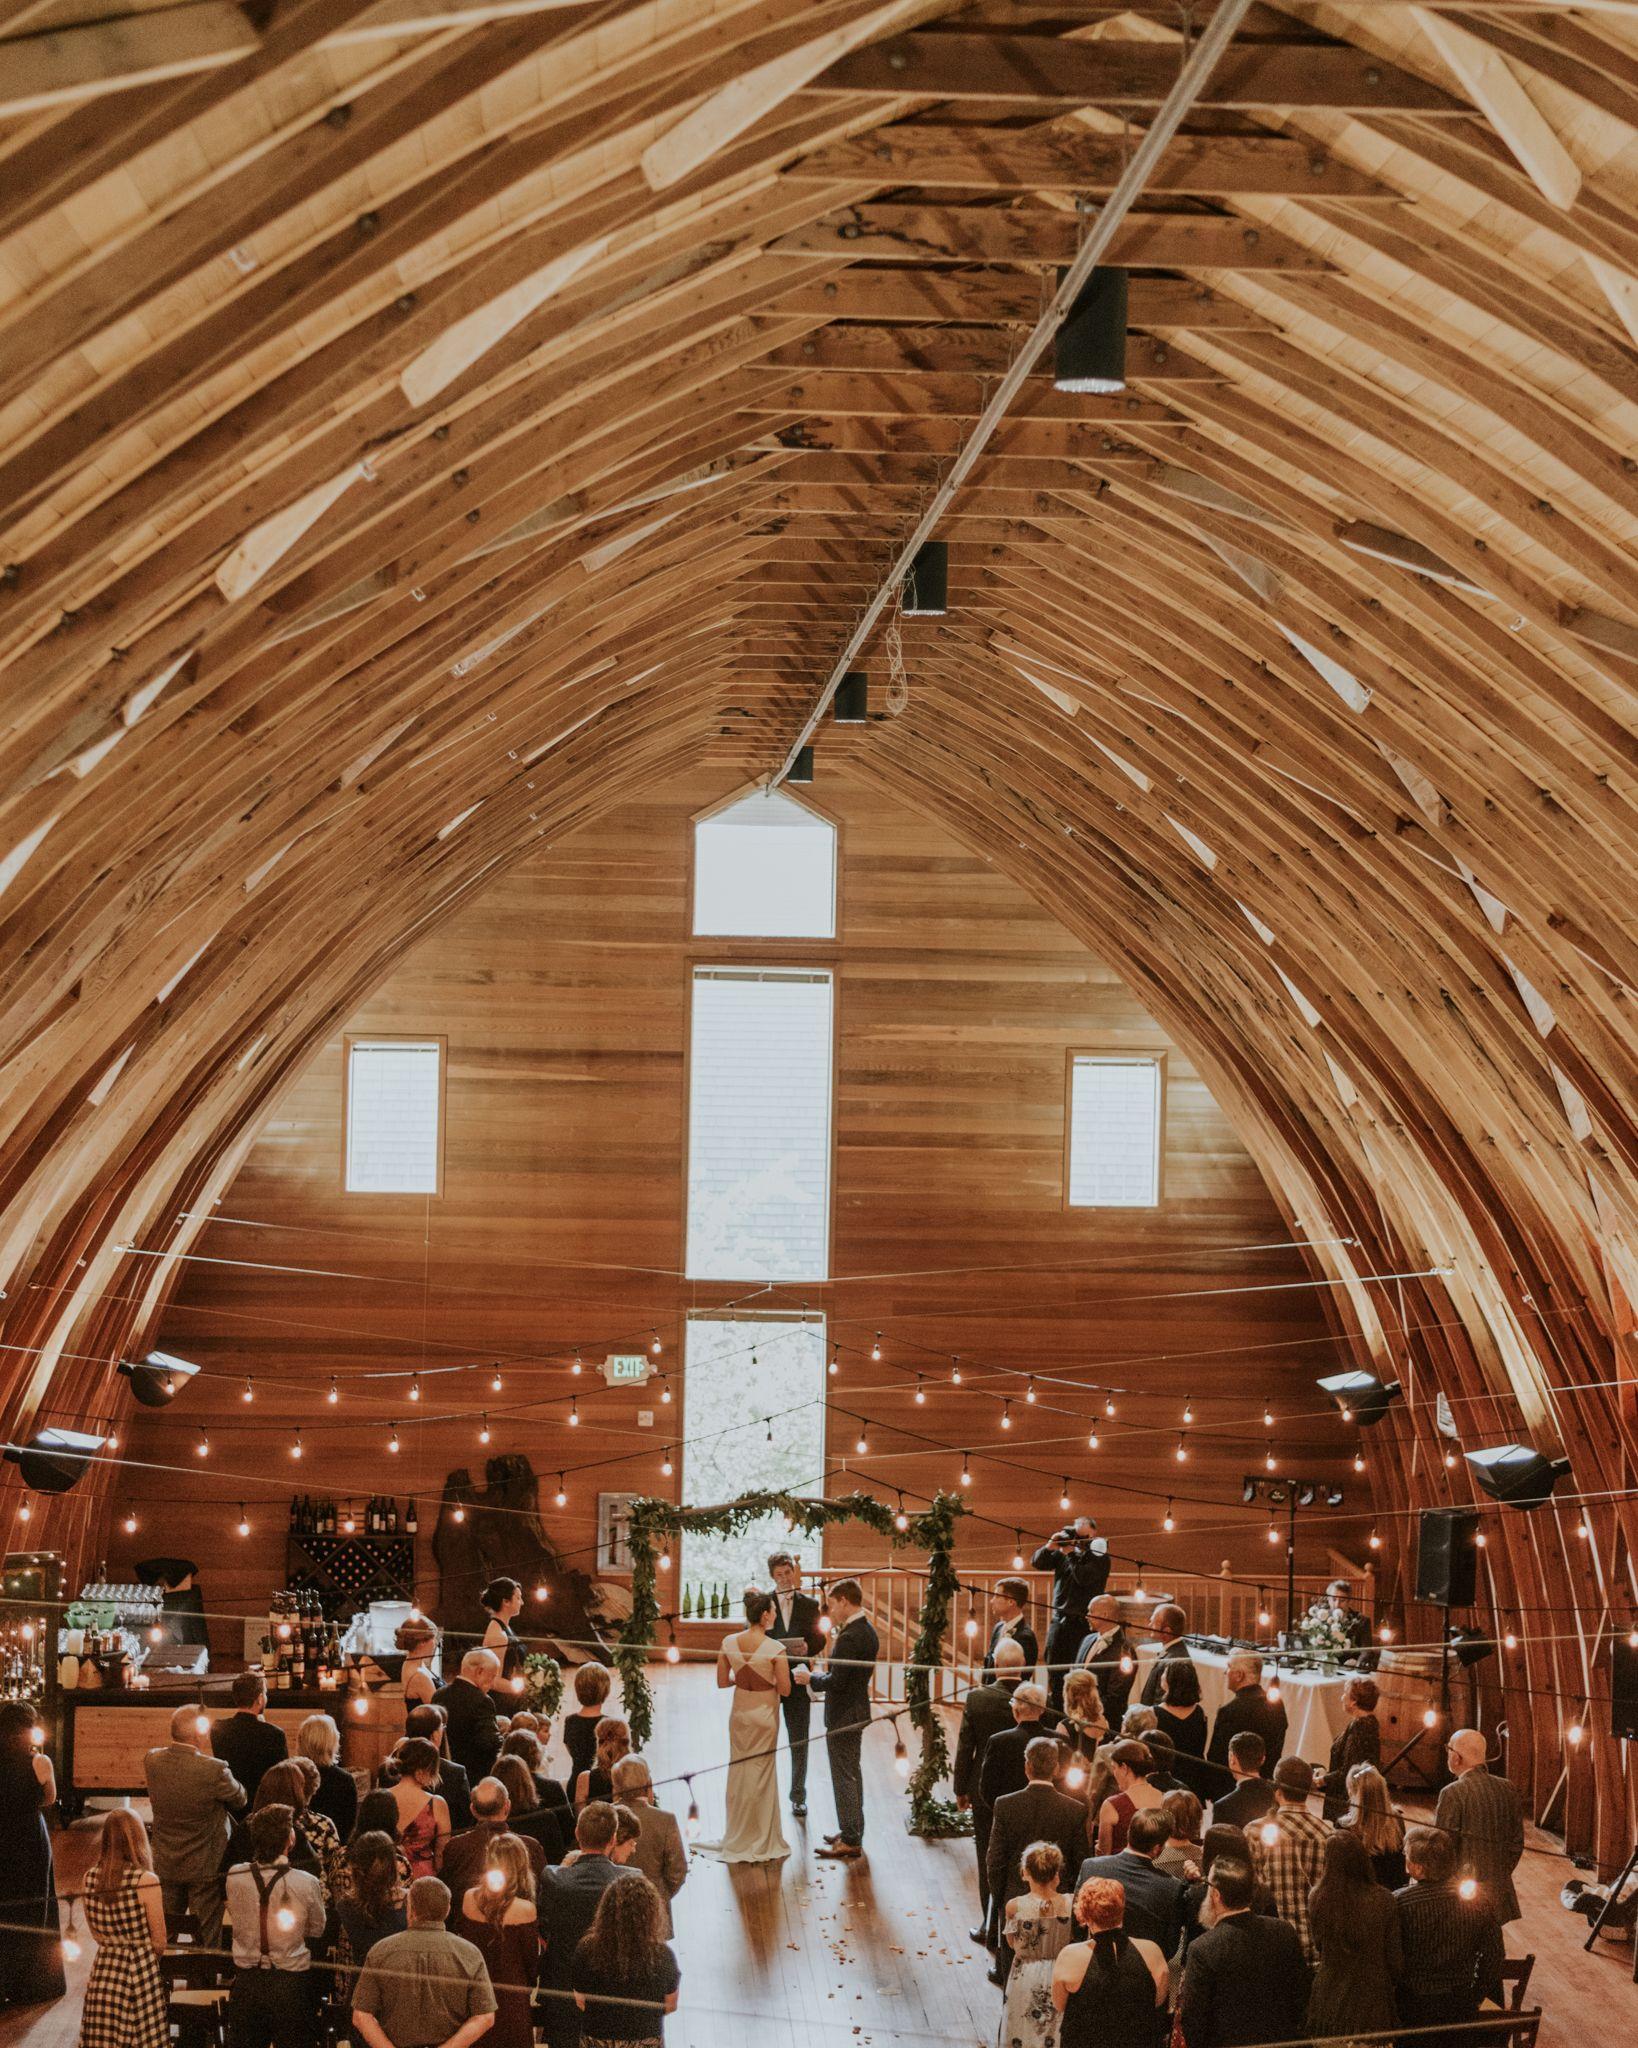 Indoor wedding venue near Seattle, Washington. Photo by